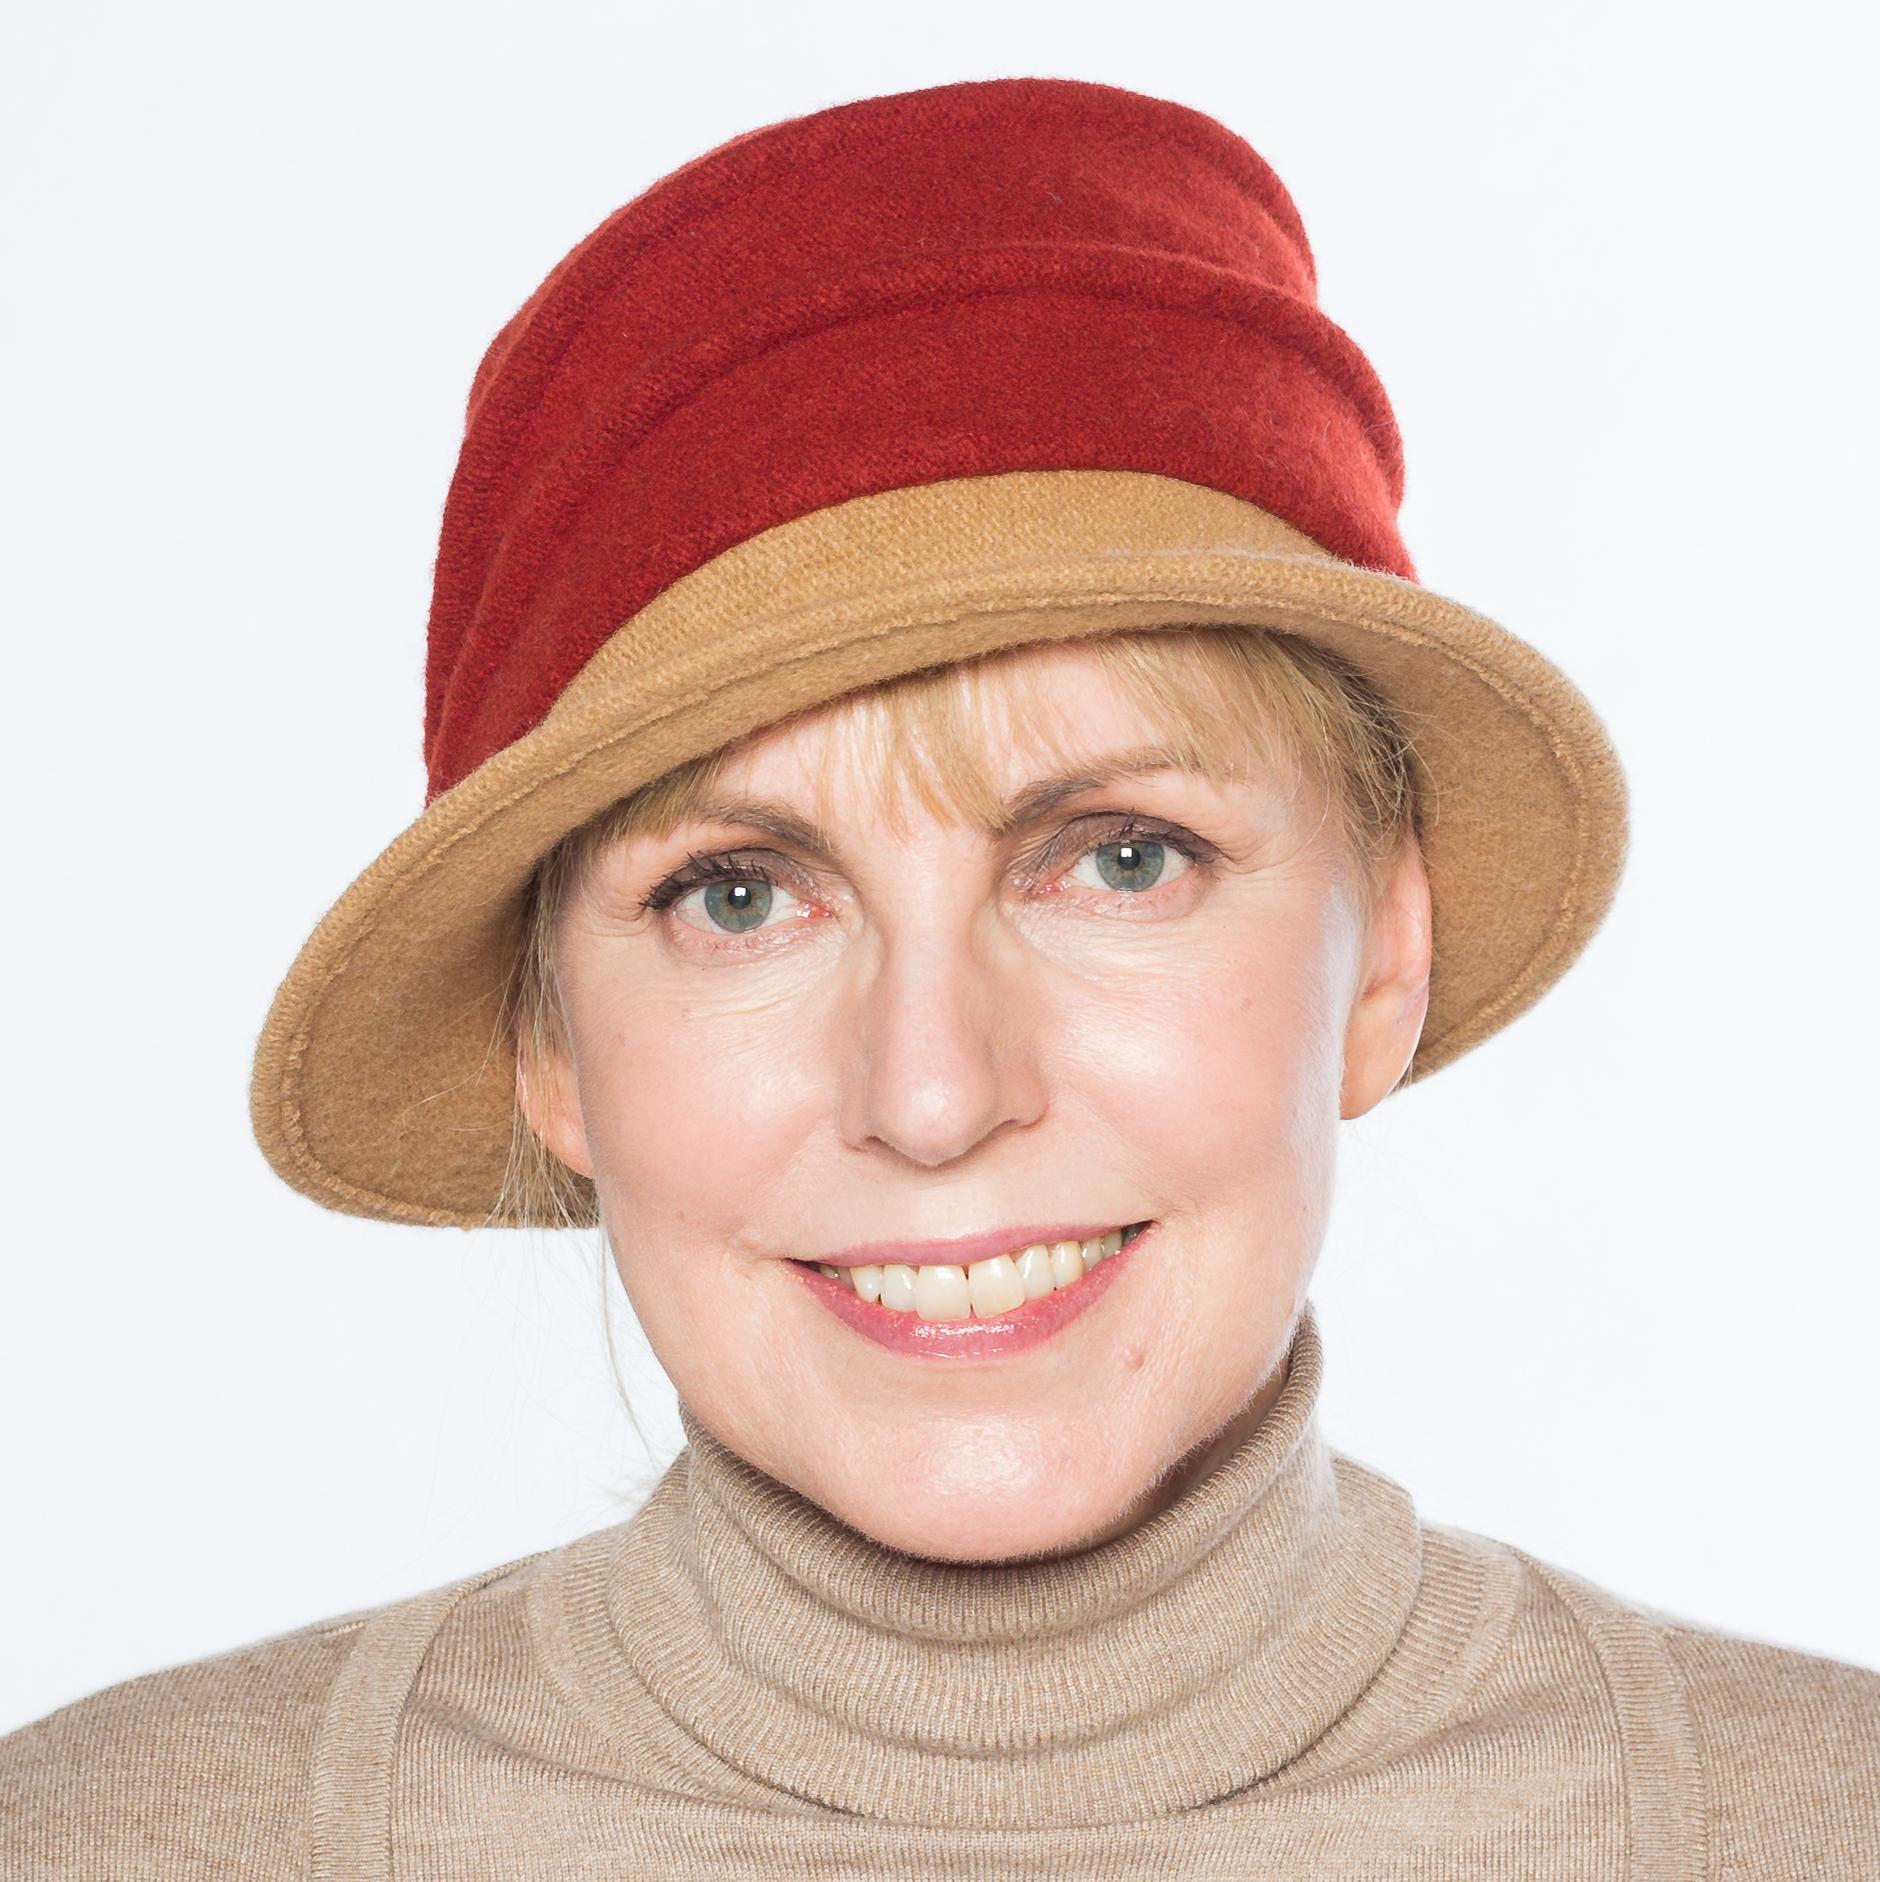 Hüte von Hand Calotta bicolor camel-rost